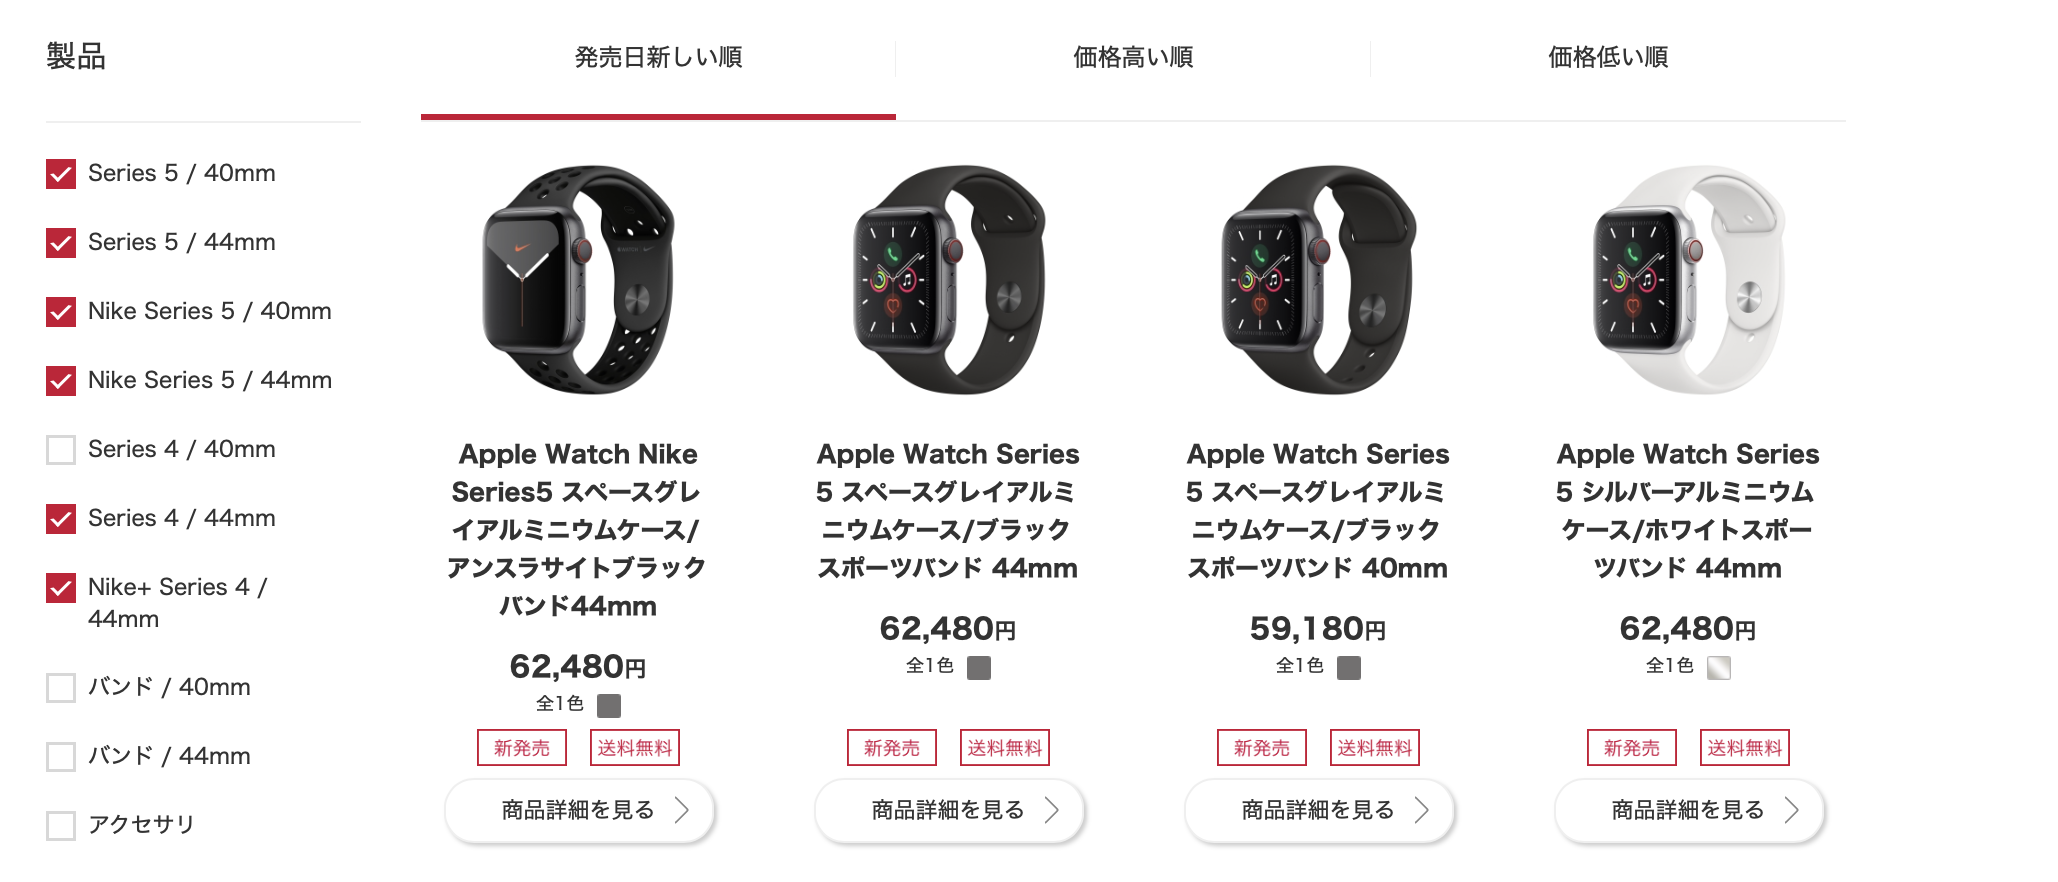 Apple Watchドコモオンラインショップ